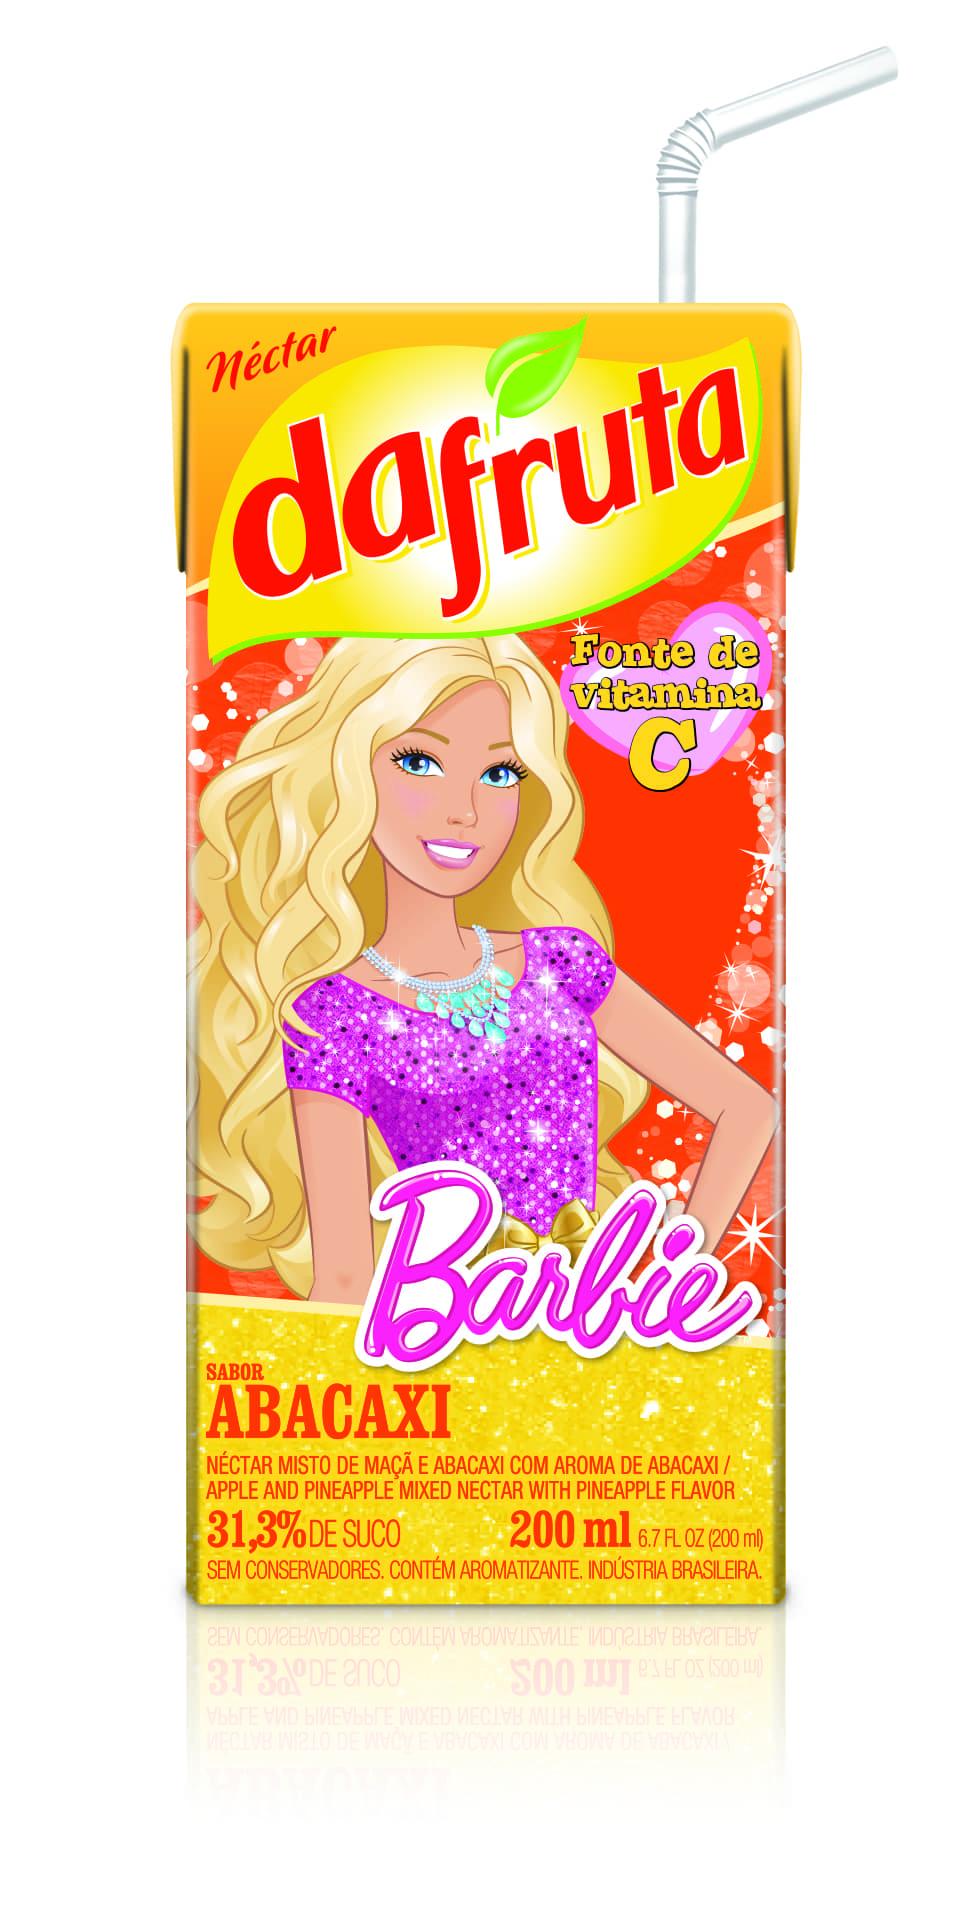 Dafruta-Barbie-Abacaxi-200-ml